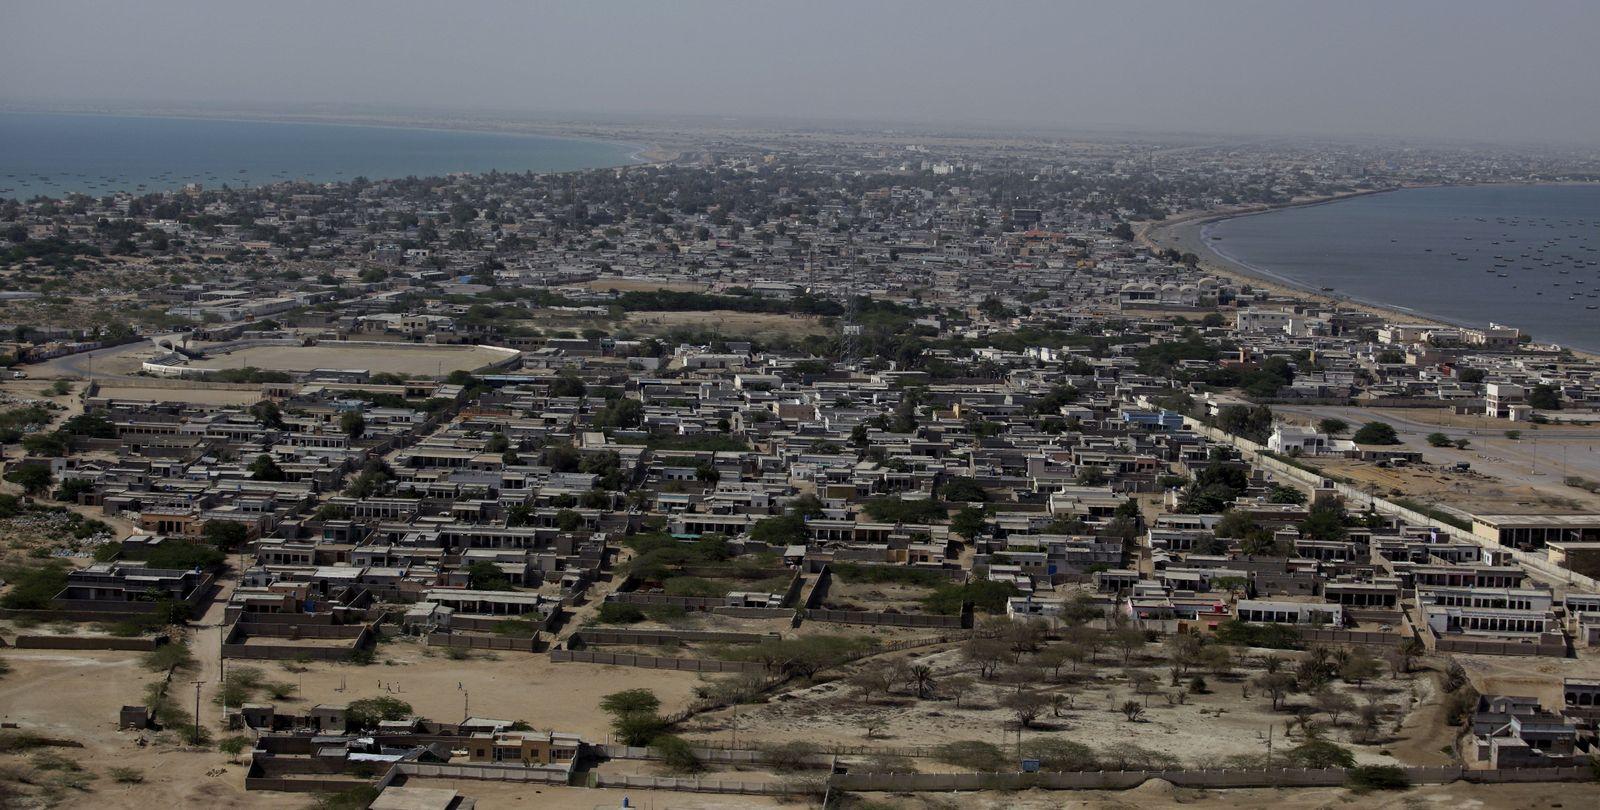 Gwadar/ Pakistan